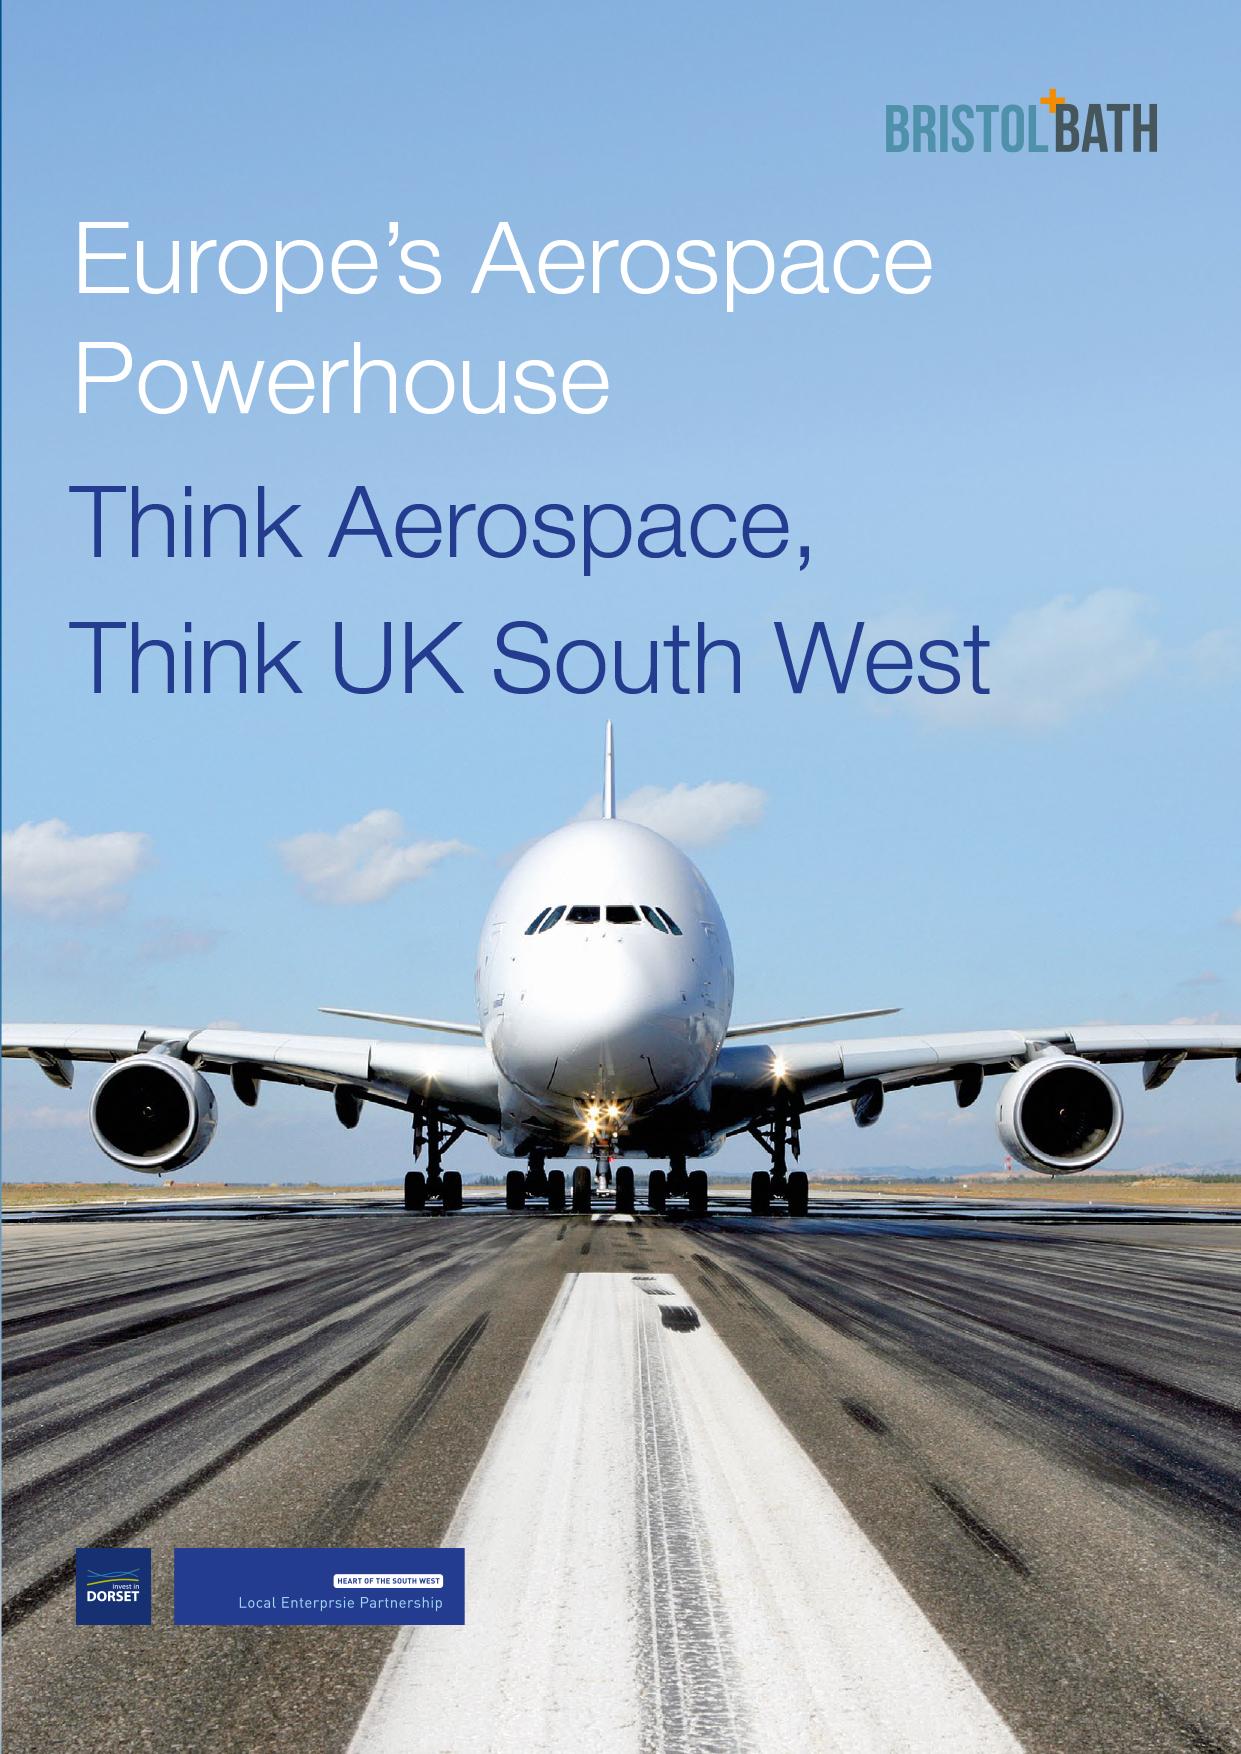 European-Aerospace-Powerhouse-1